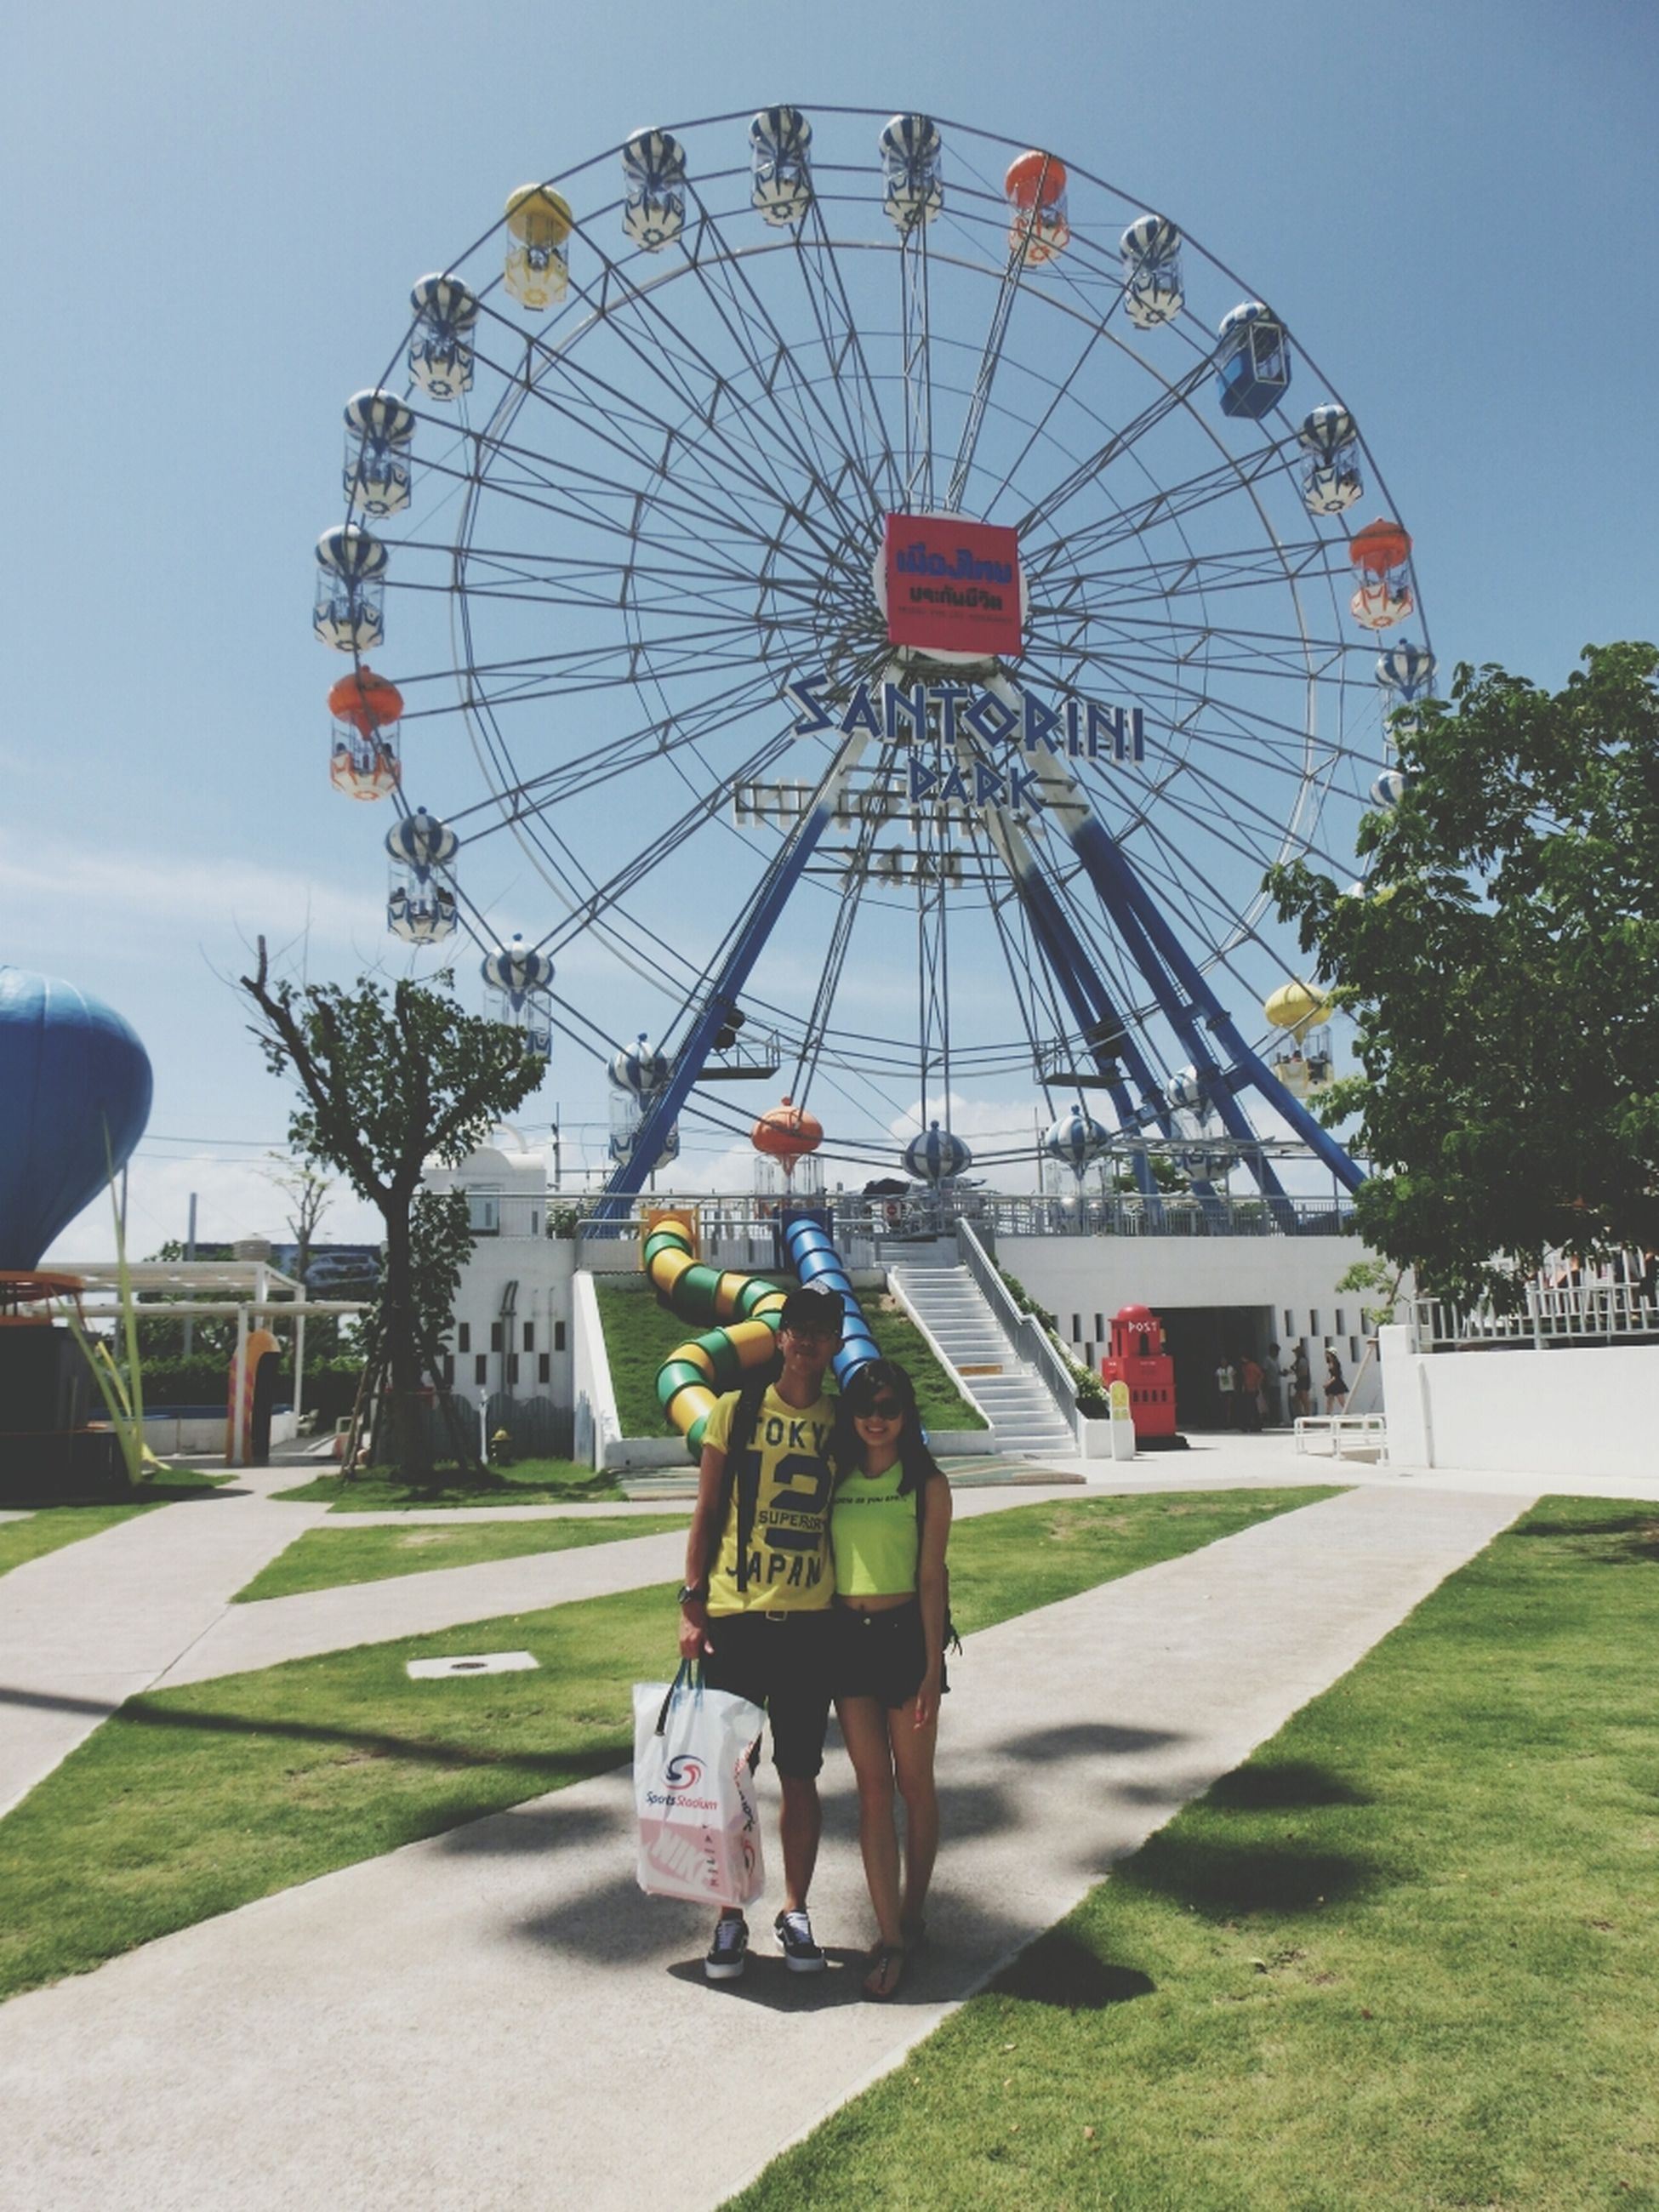 amusement park, amusement park ride, arts culture and entertainment, leisure activity, ferris wheel, lifestyles, sky, men, built structure, fun, grass, enjoyment, architecture, person, tree, park - man made space, incidental people, clear sky, day